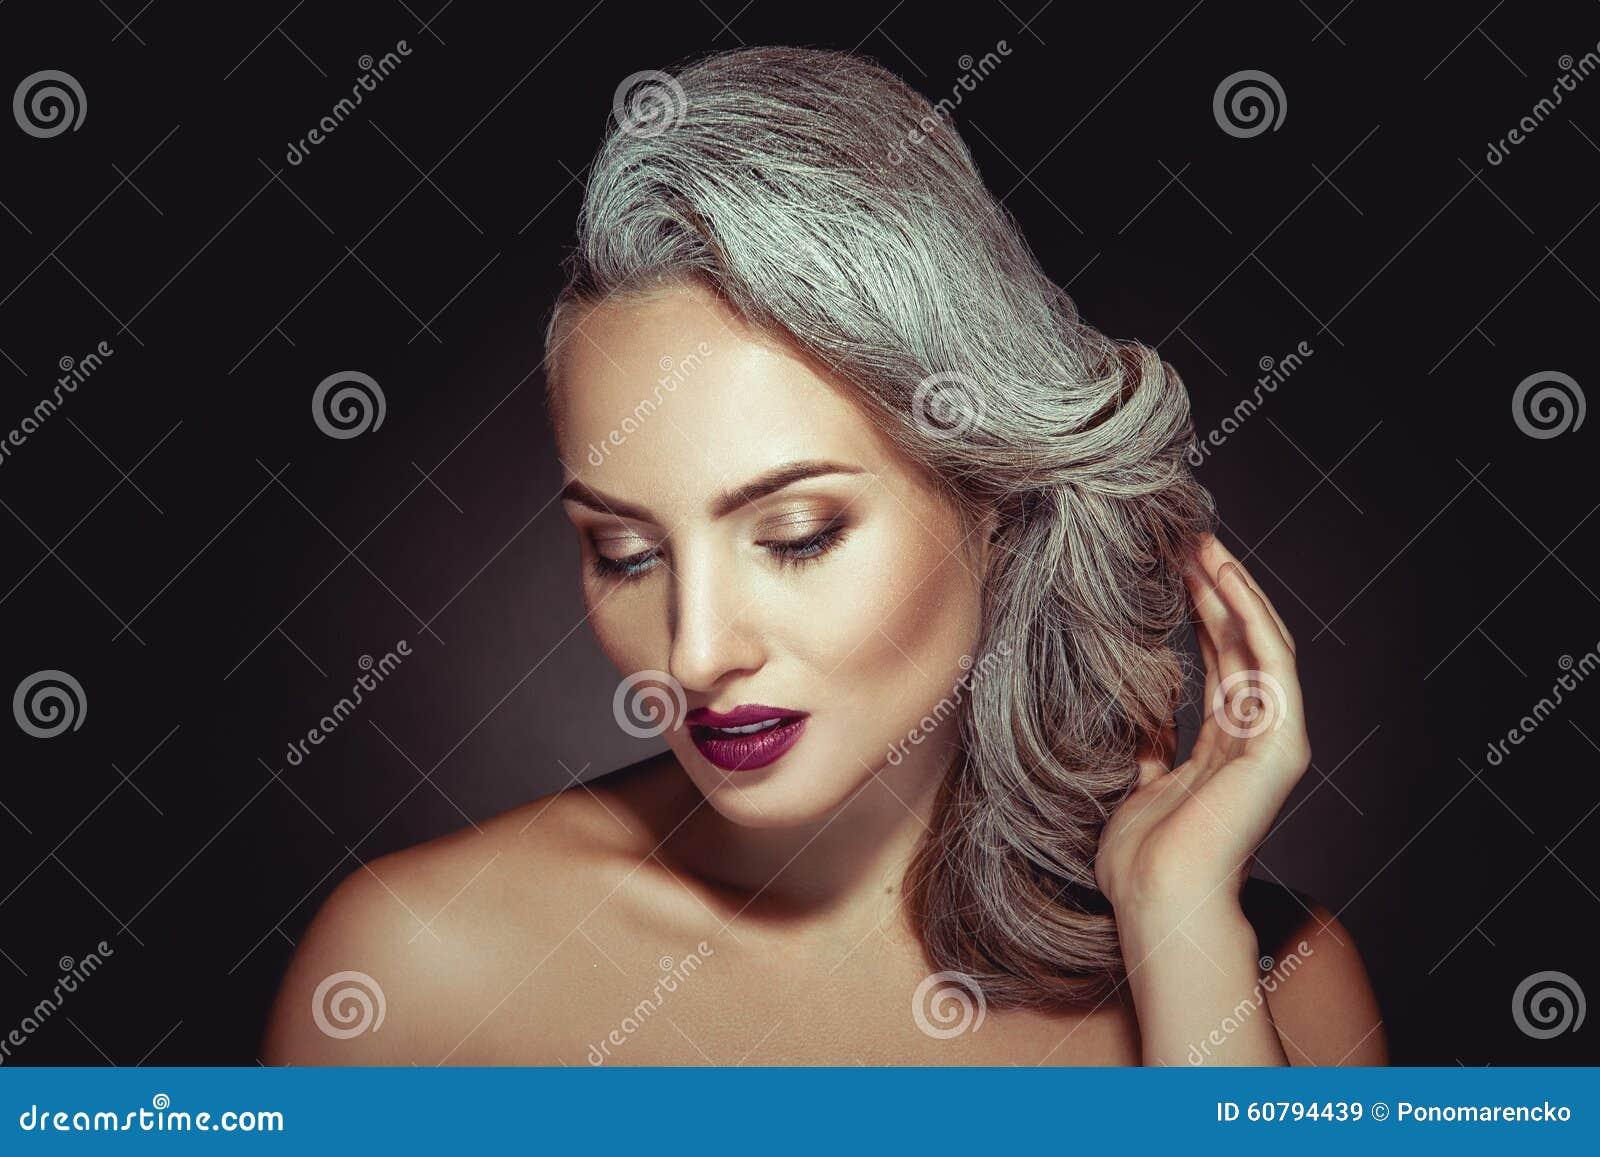 Beautiful Woman With Grey Hair Color And Nice Makeup Stock Image